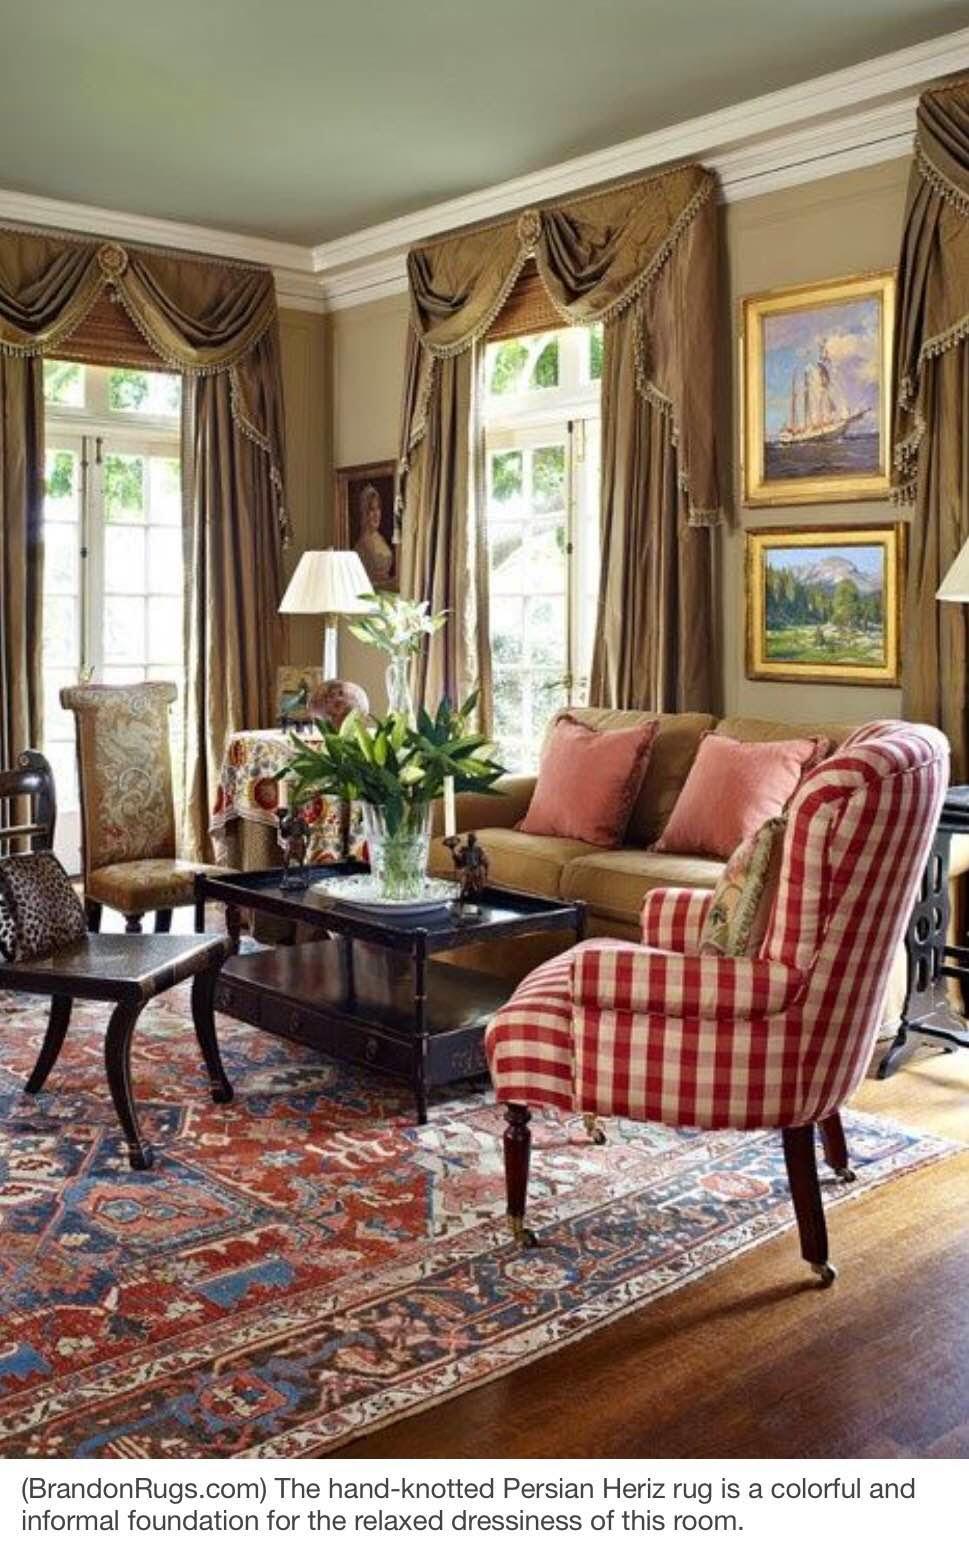 Brandon Oriental Rugs: More Home Decor Ideas Using Real ...